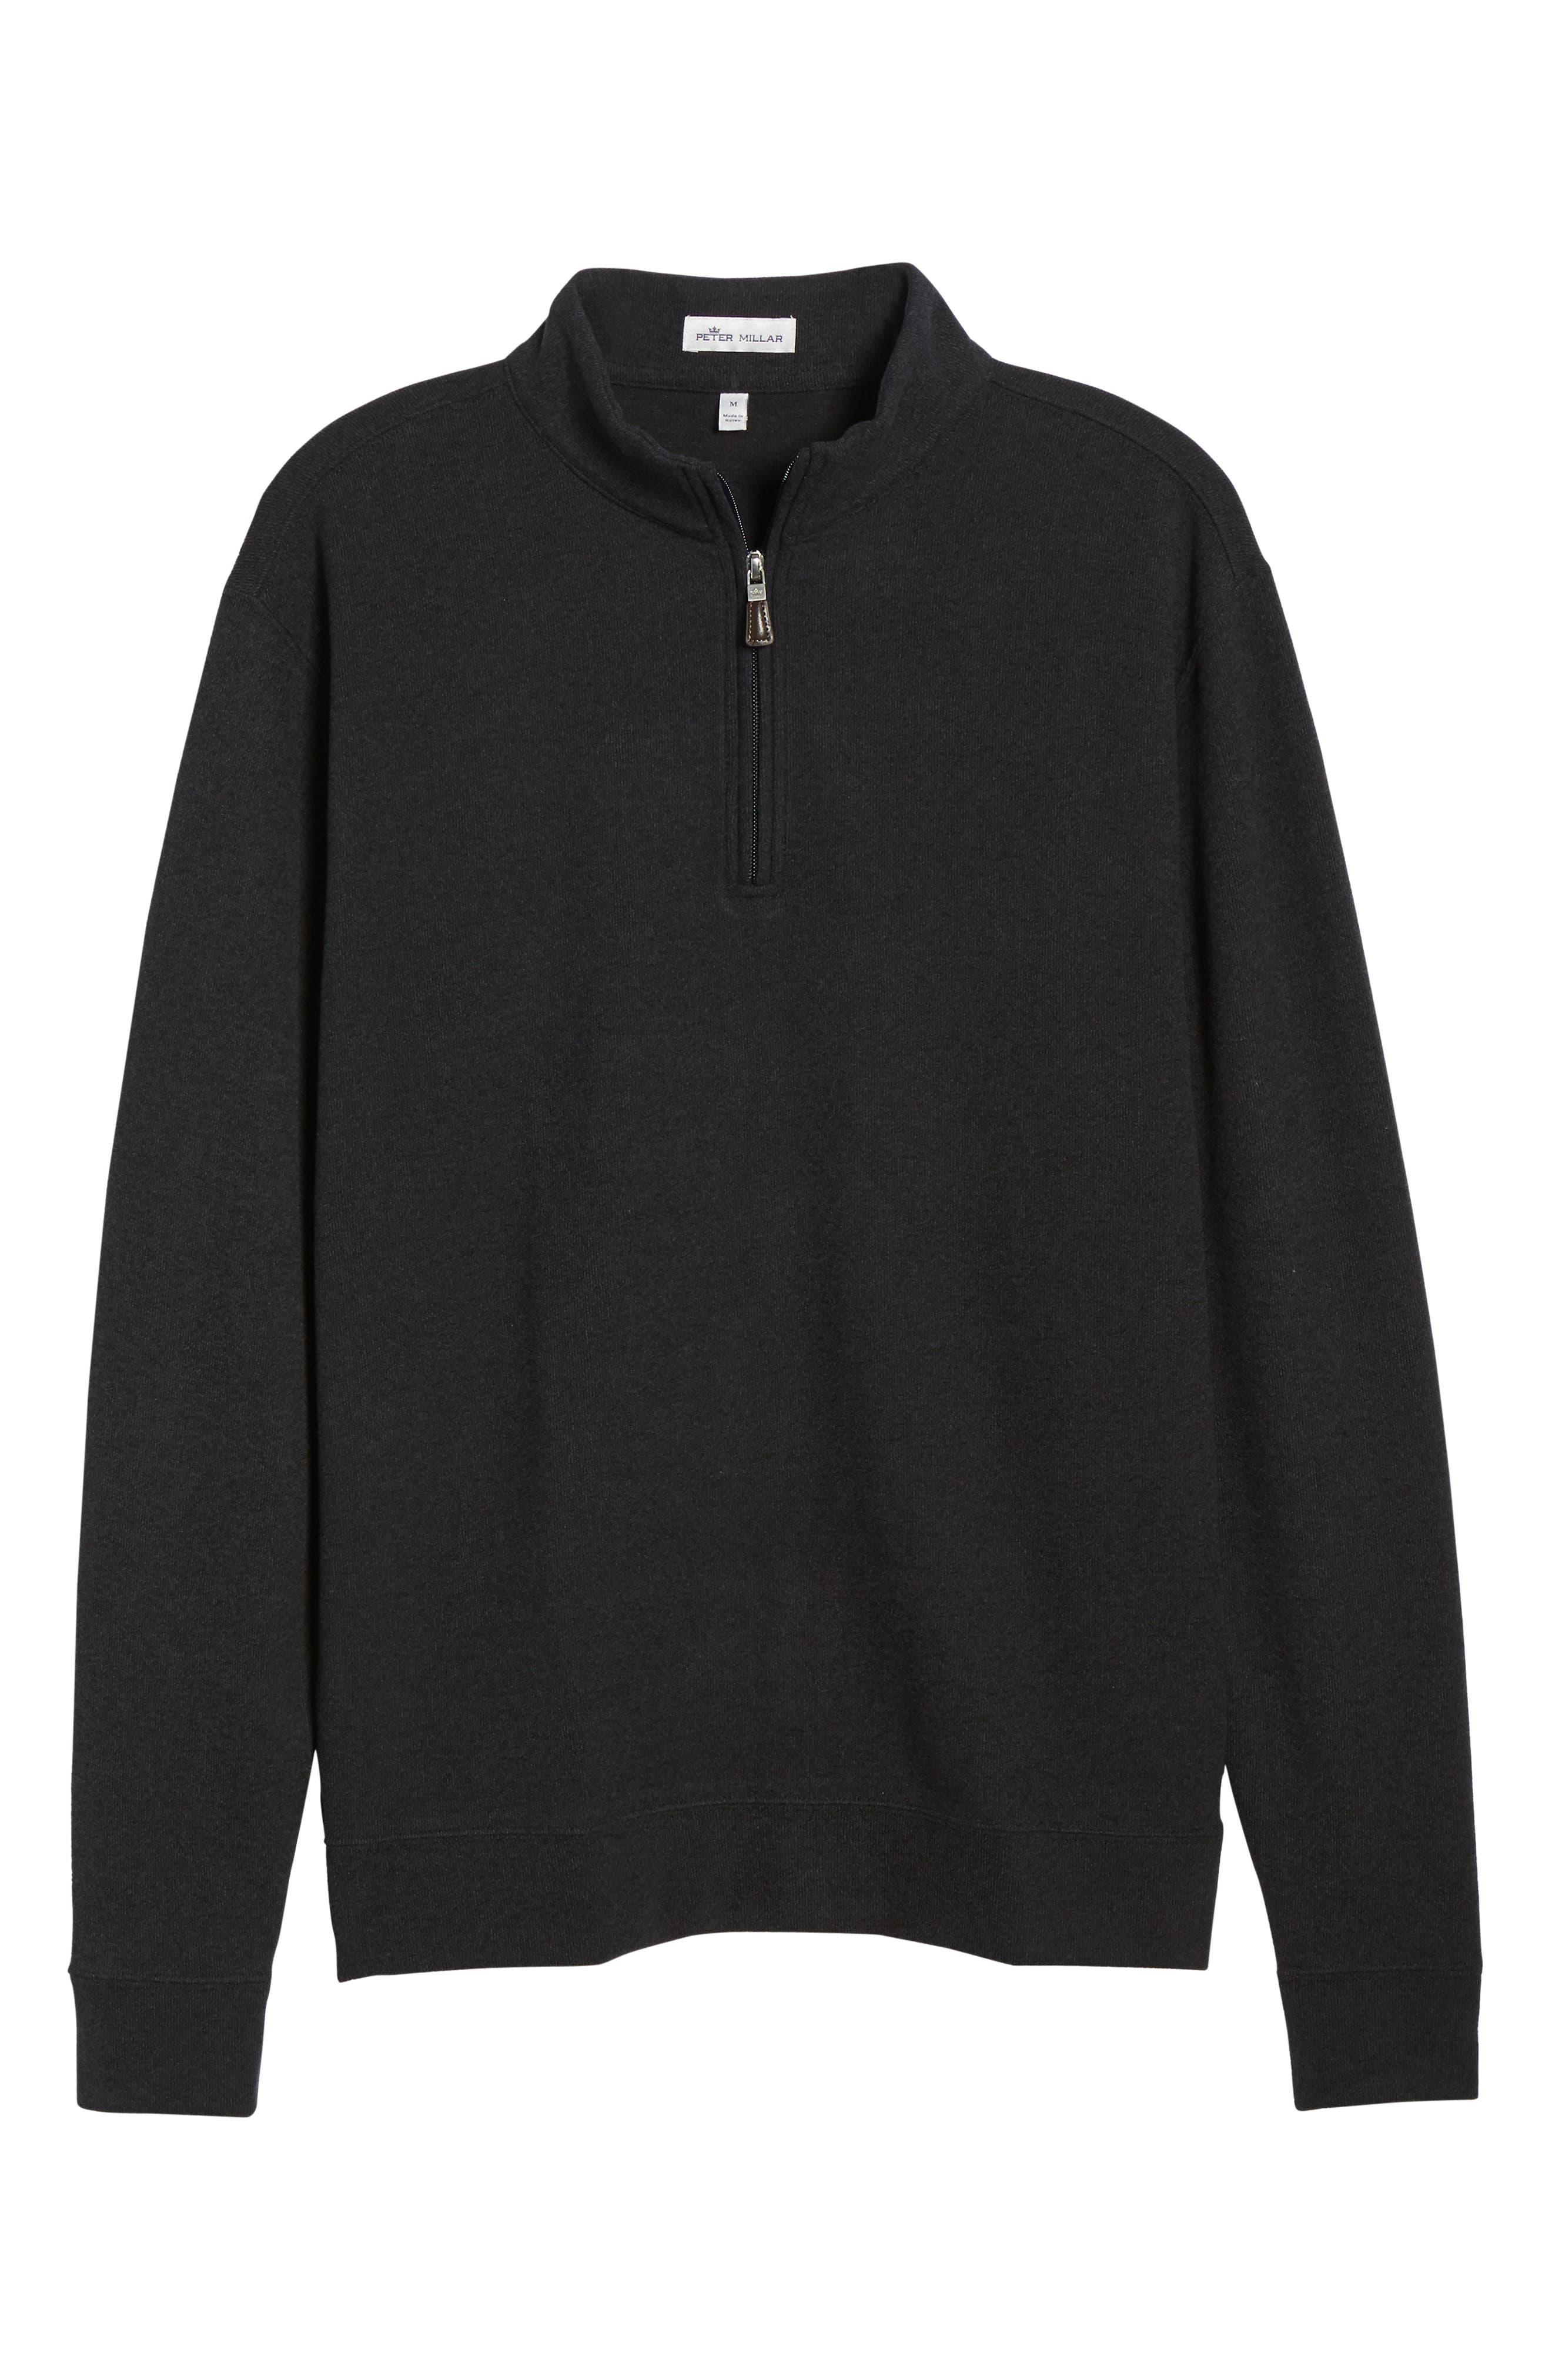 PETER MILLAR, Half Zip Pullover, Alternate thumbnail 6, color, BLACK